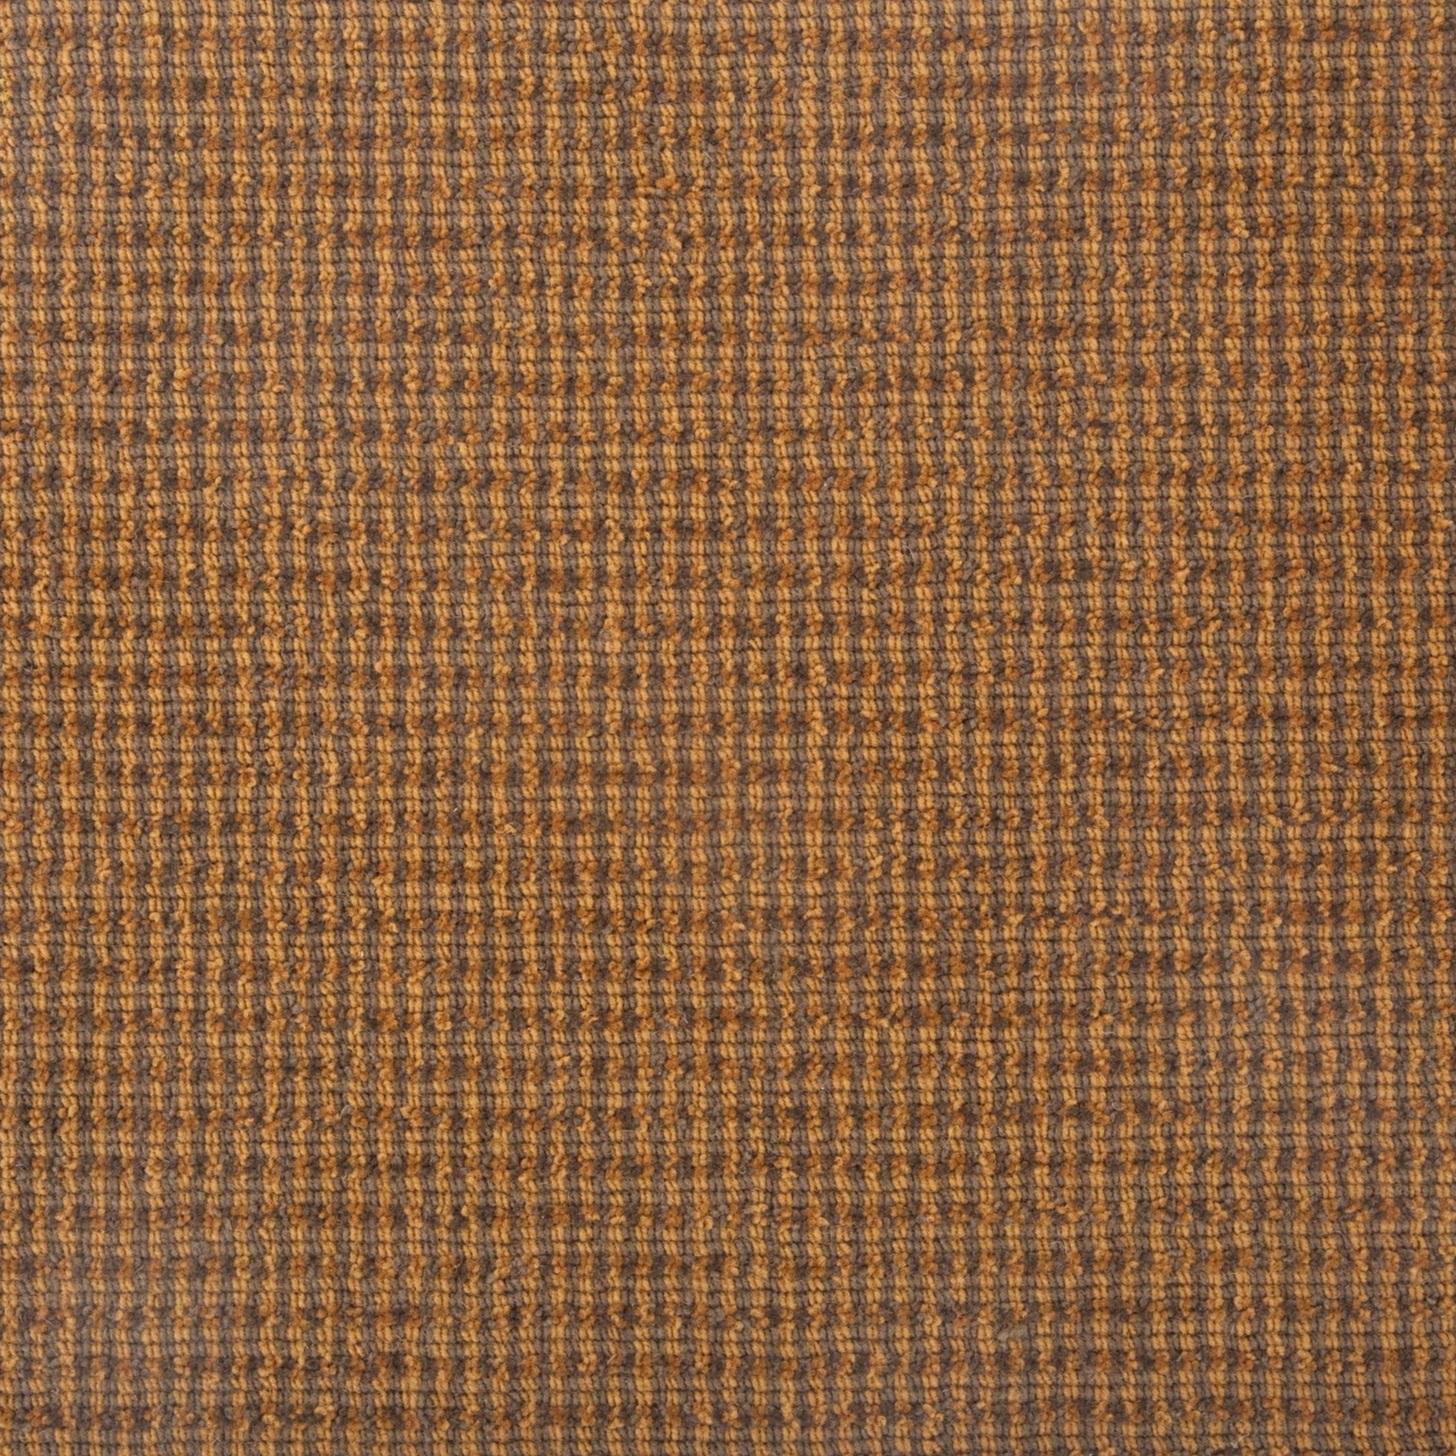 Marillo Frisé Stripes 4026 1M1N